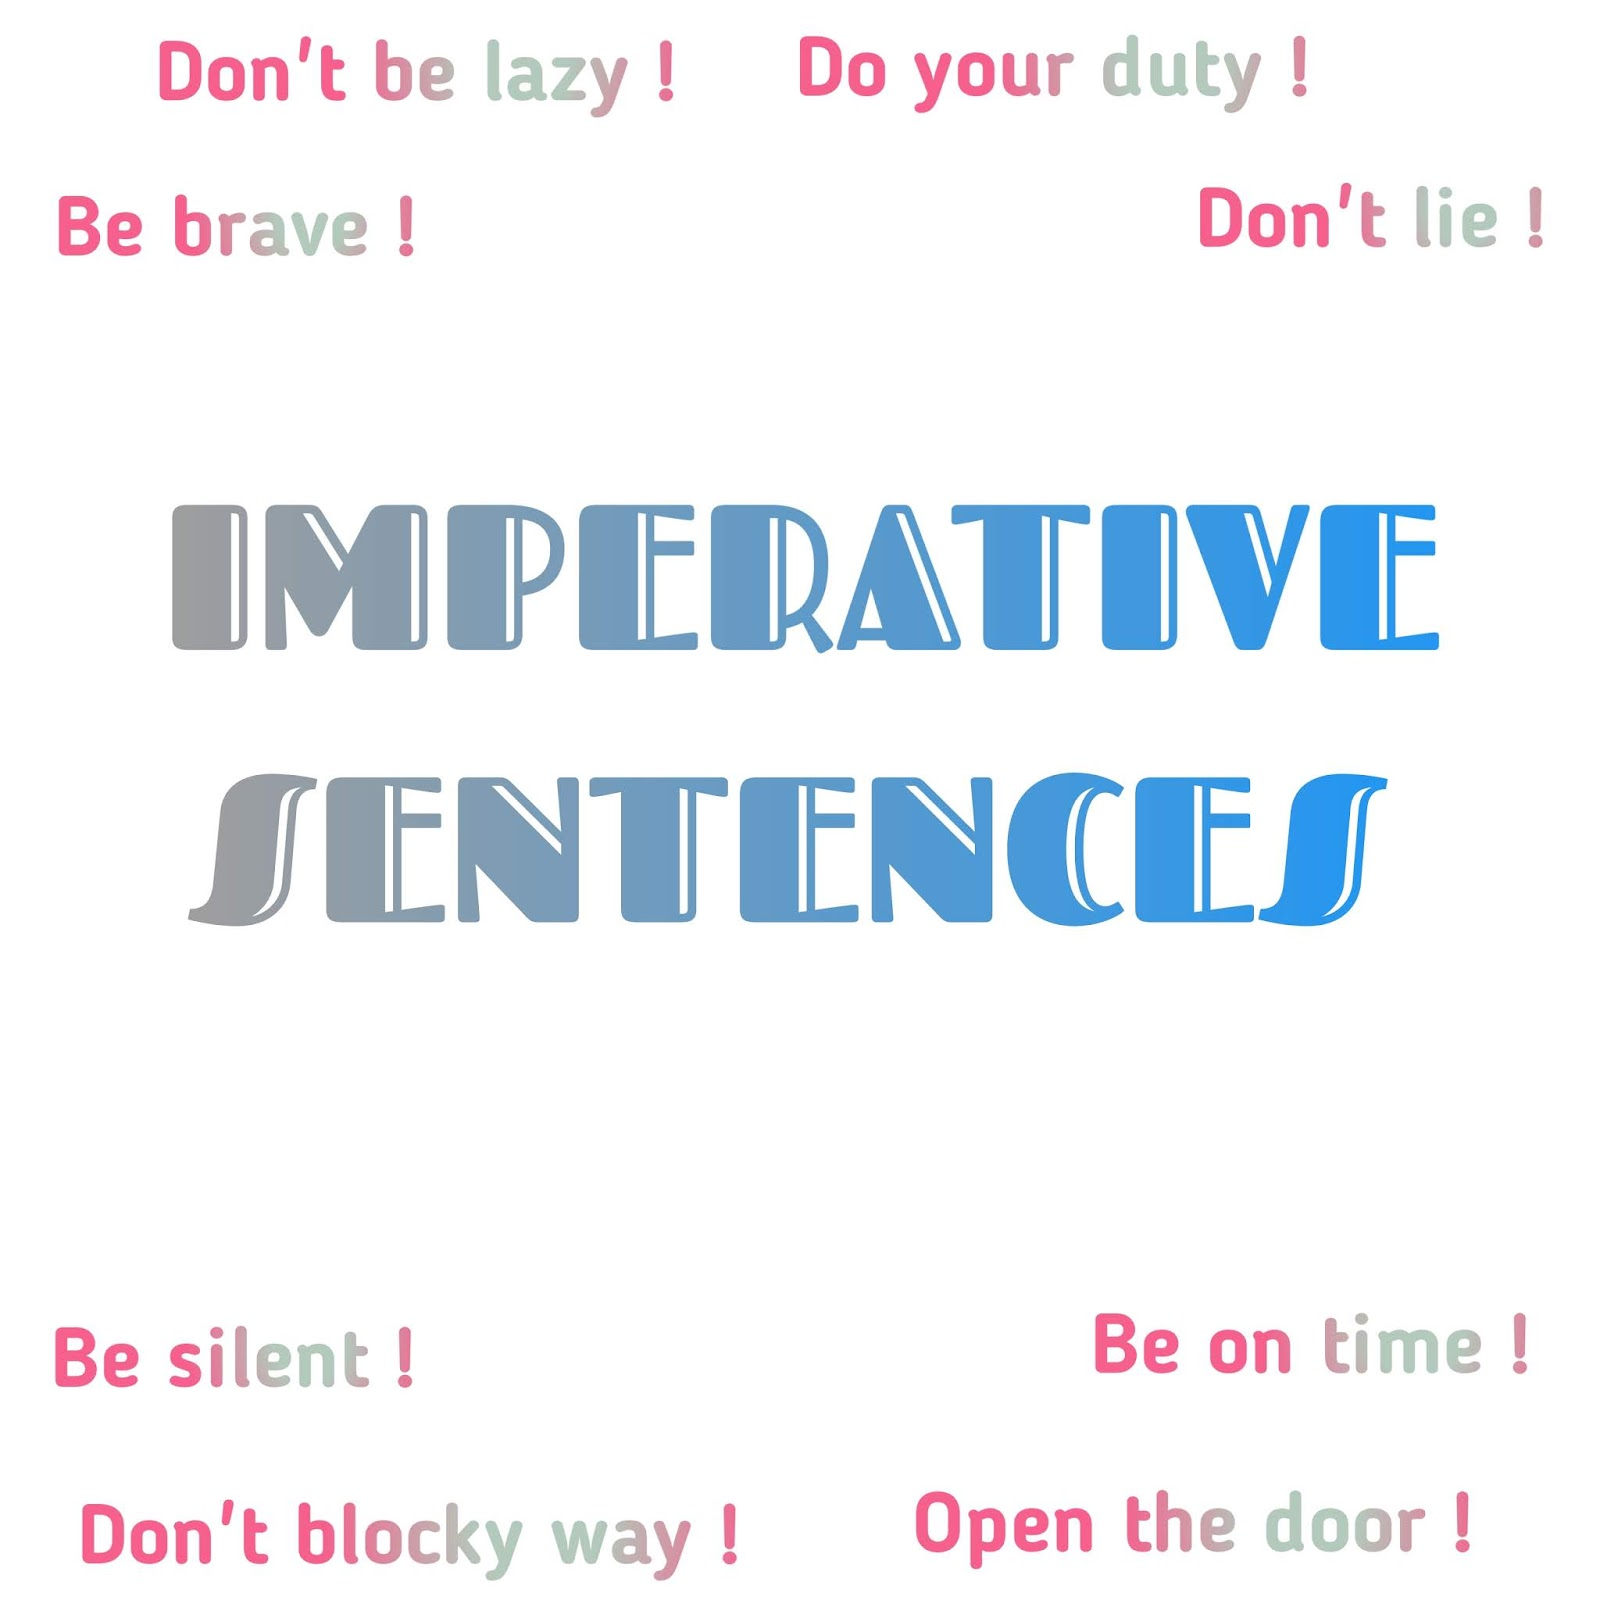 Imperative Sentence | Pengertian Macam dan Contoh Kalimat ...